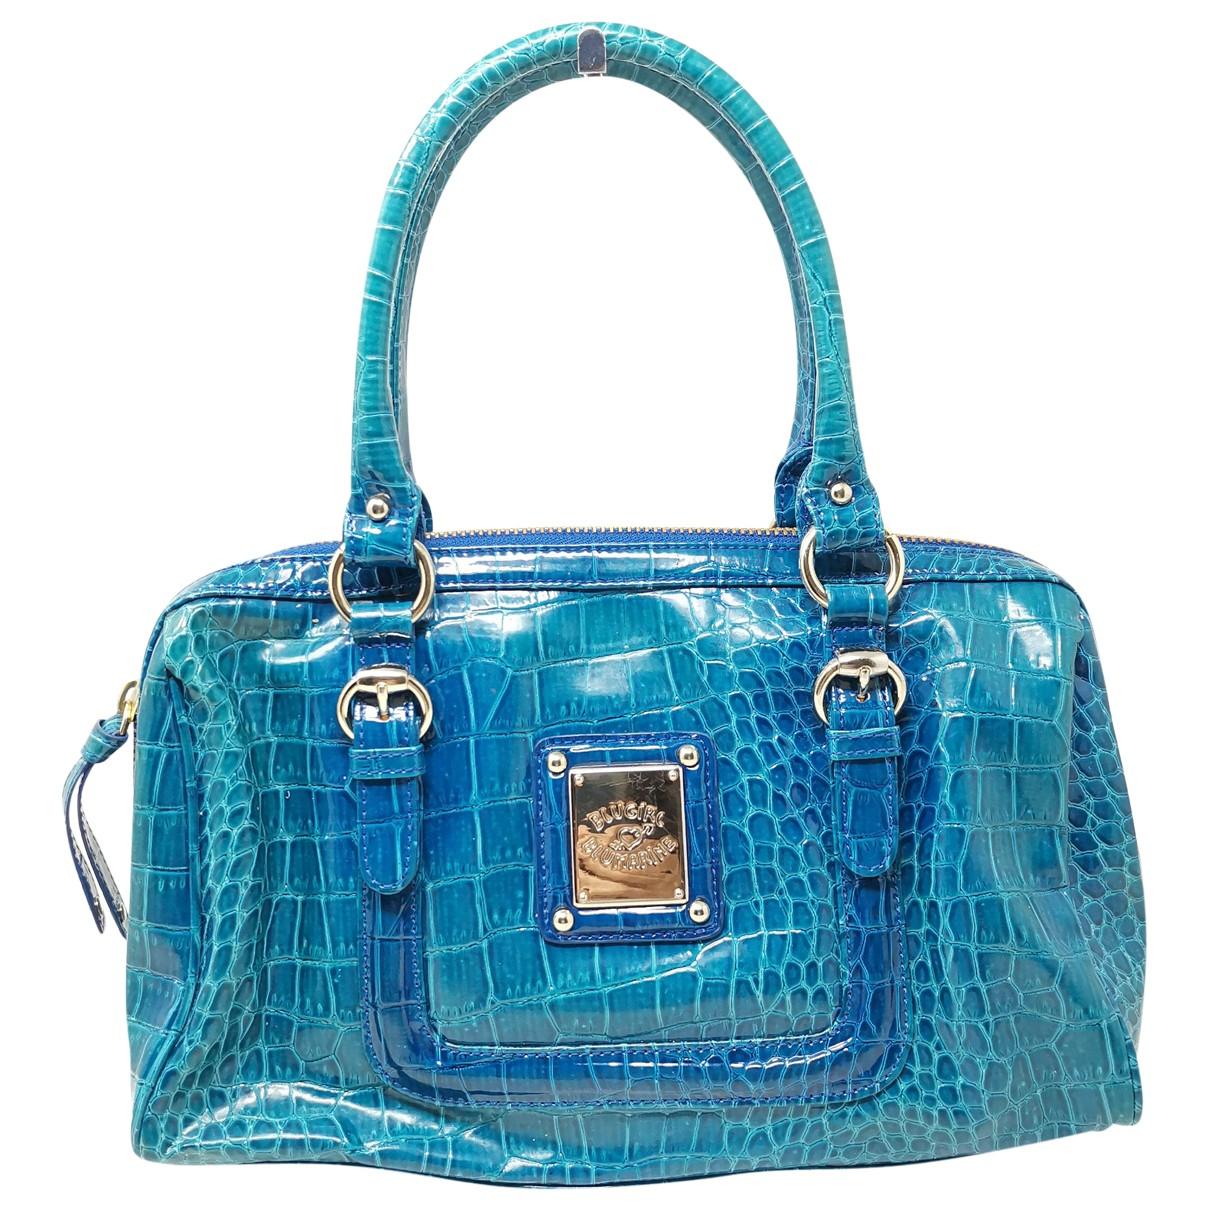 Blumarine \N Turquoise Patent leather handbag for Women \N